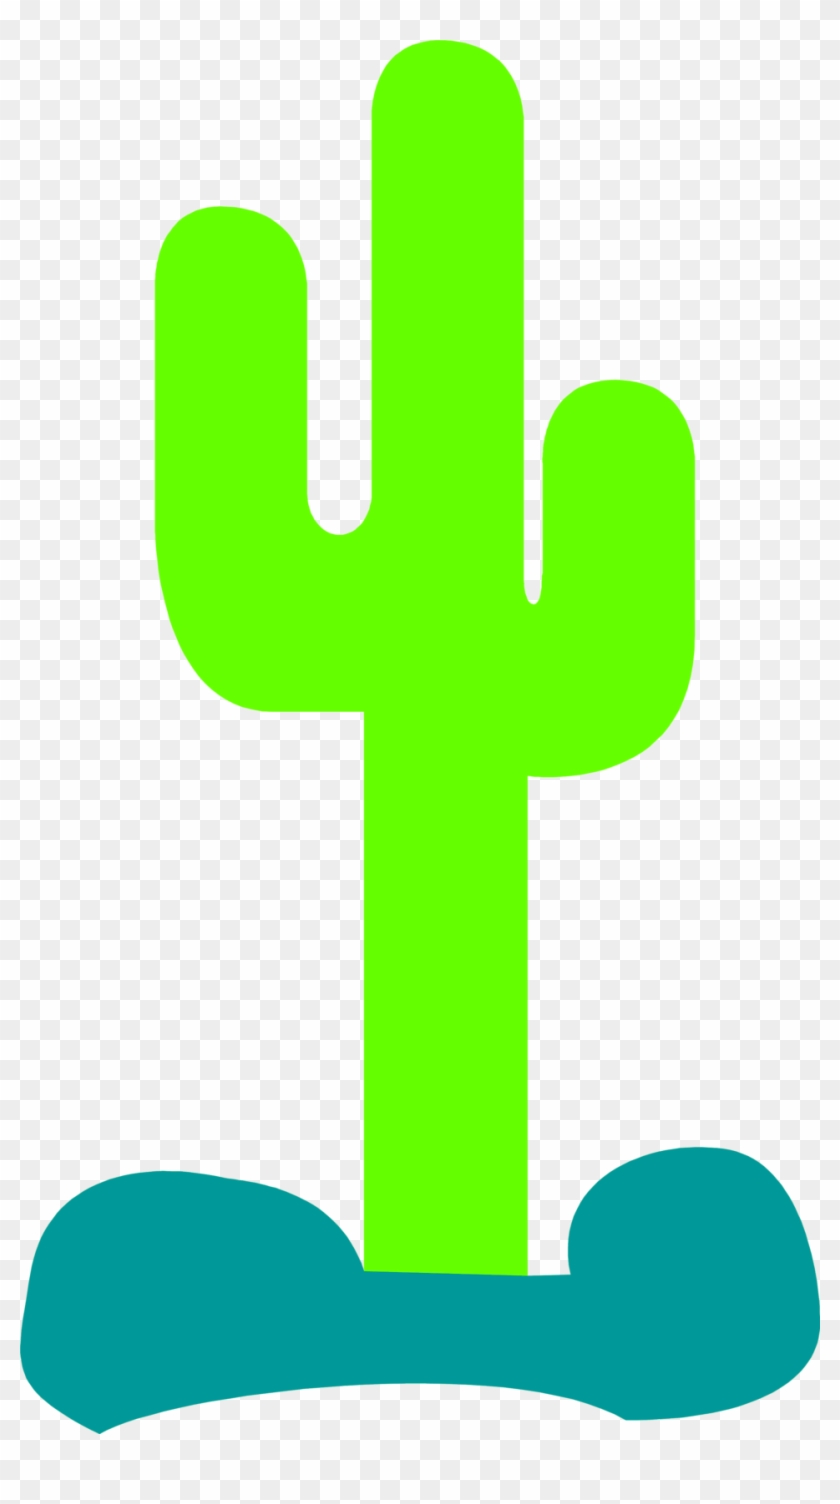 Cactus Silhouette Clip Art - Cactus Clip Art Outline #4225